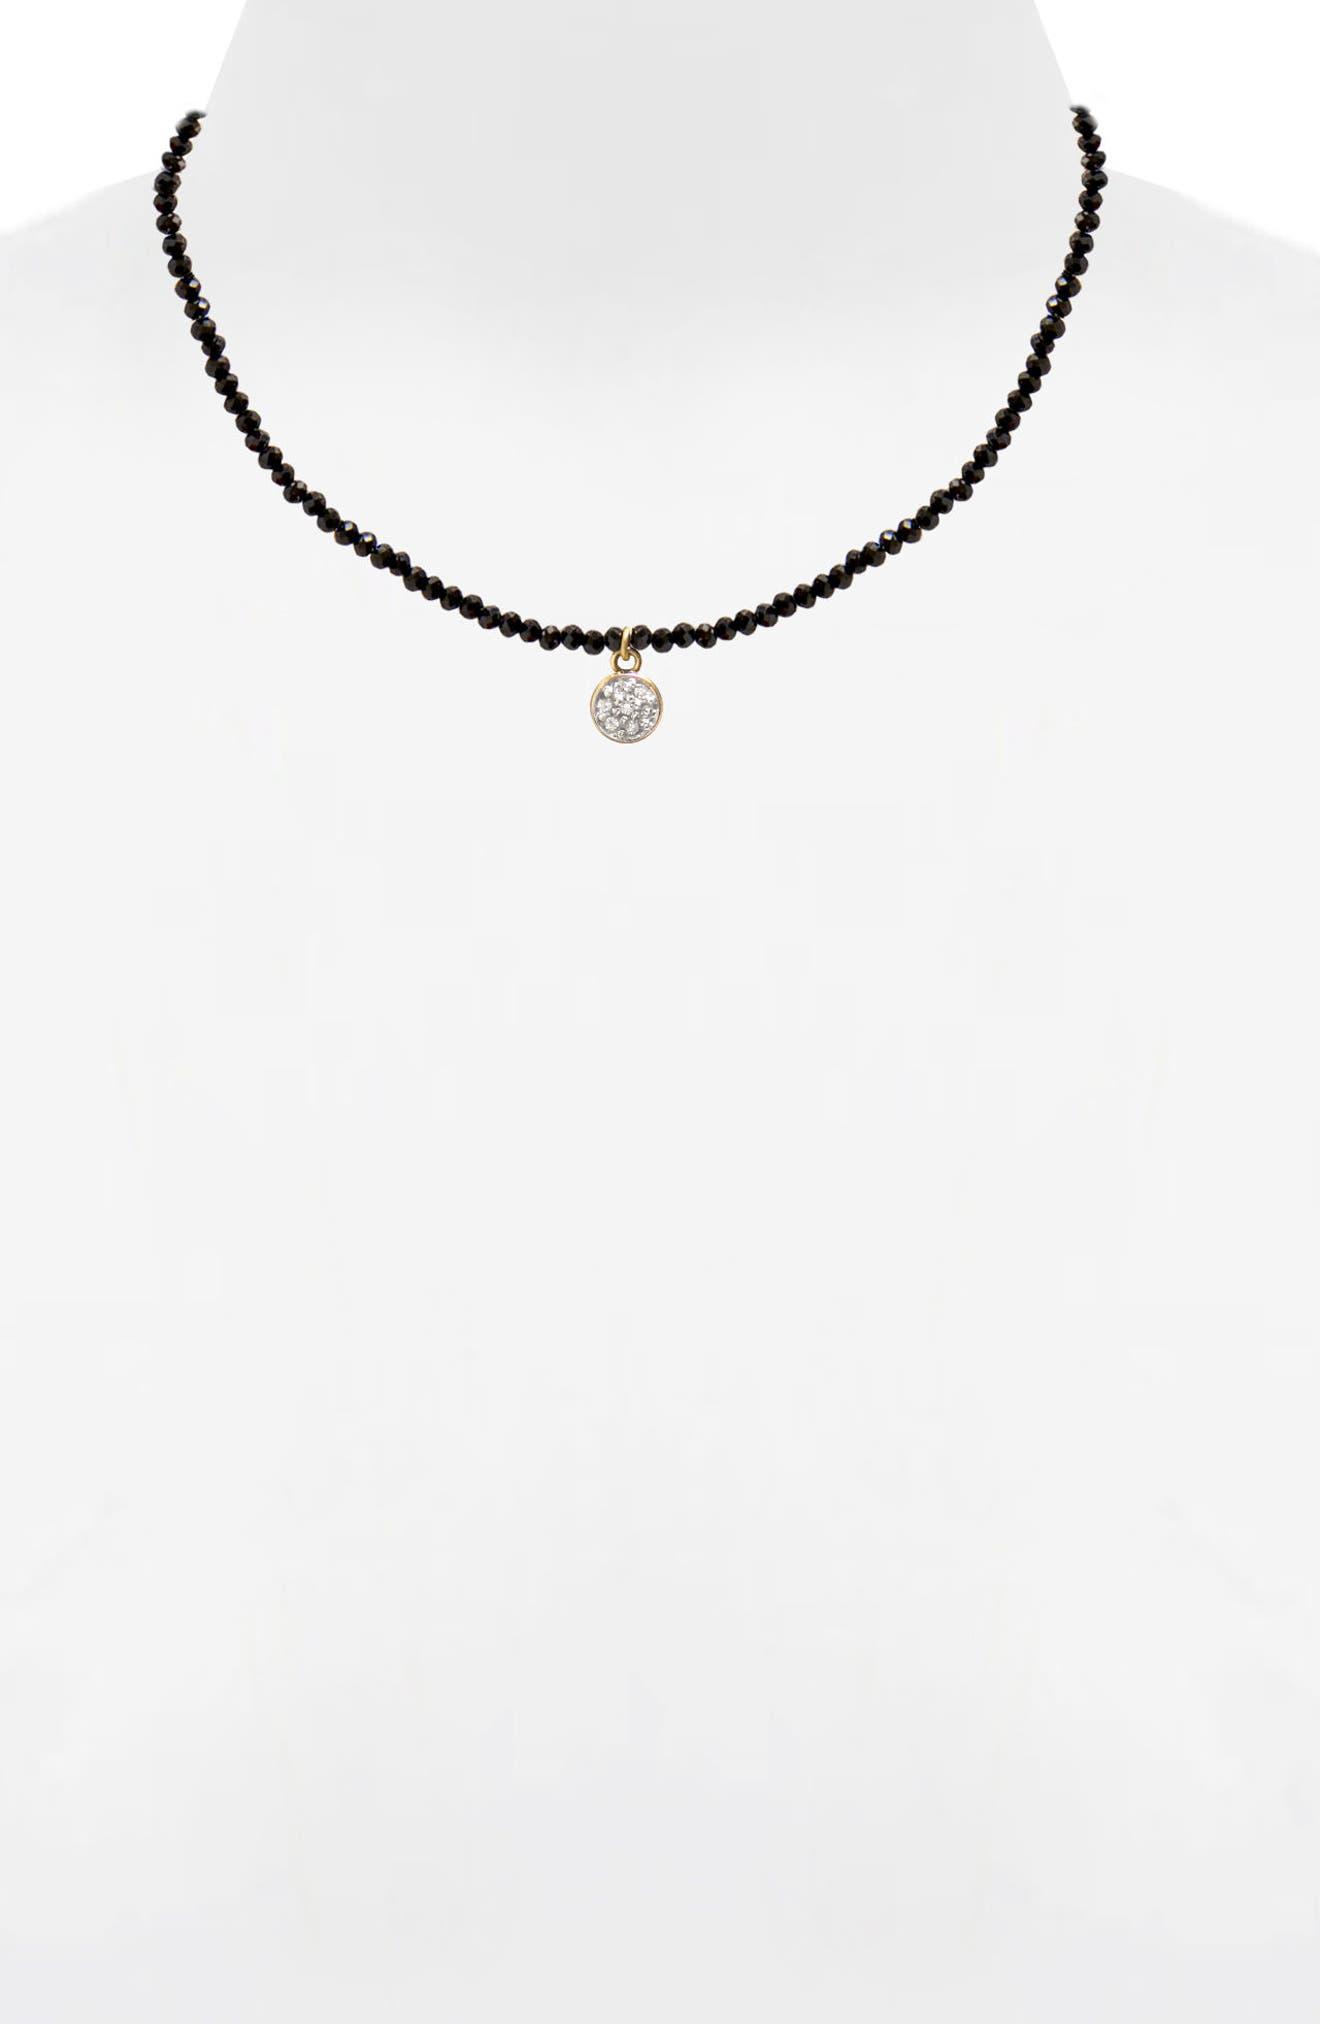 Jane Basch Diamond Circle Pendant Necklace,                             Alternate thumbnail 2, color,                             Black Onyx